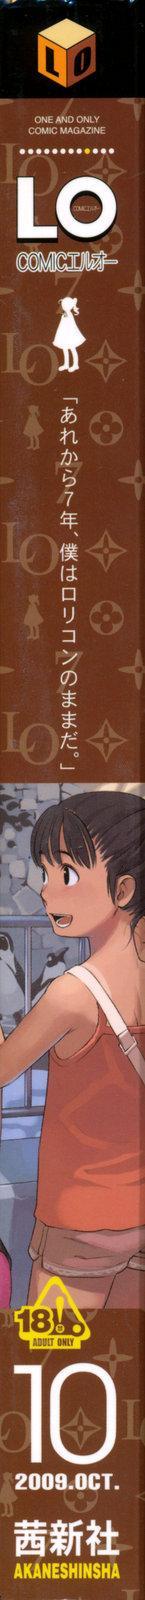 COMIC LO 2009-10 Vol. 67 1